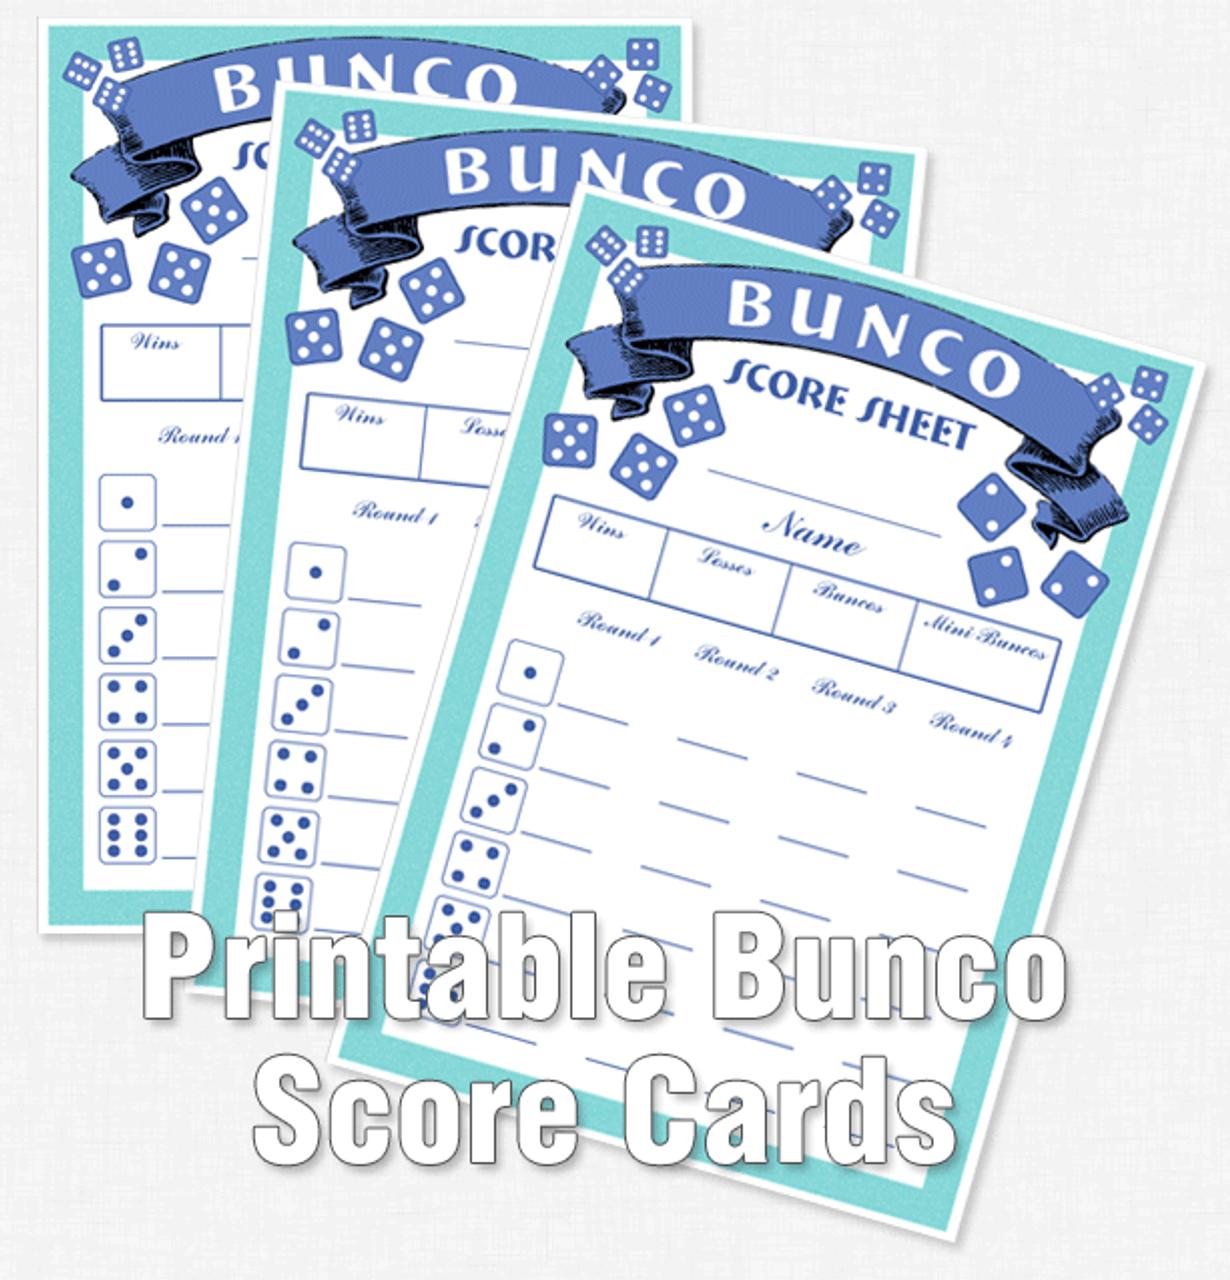 Printable Bunco Score Cards - Dice Game Depot